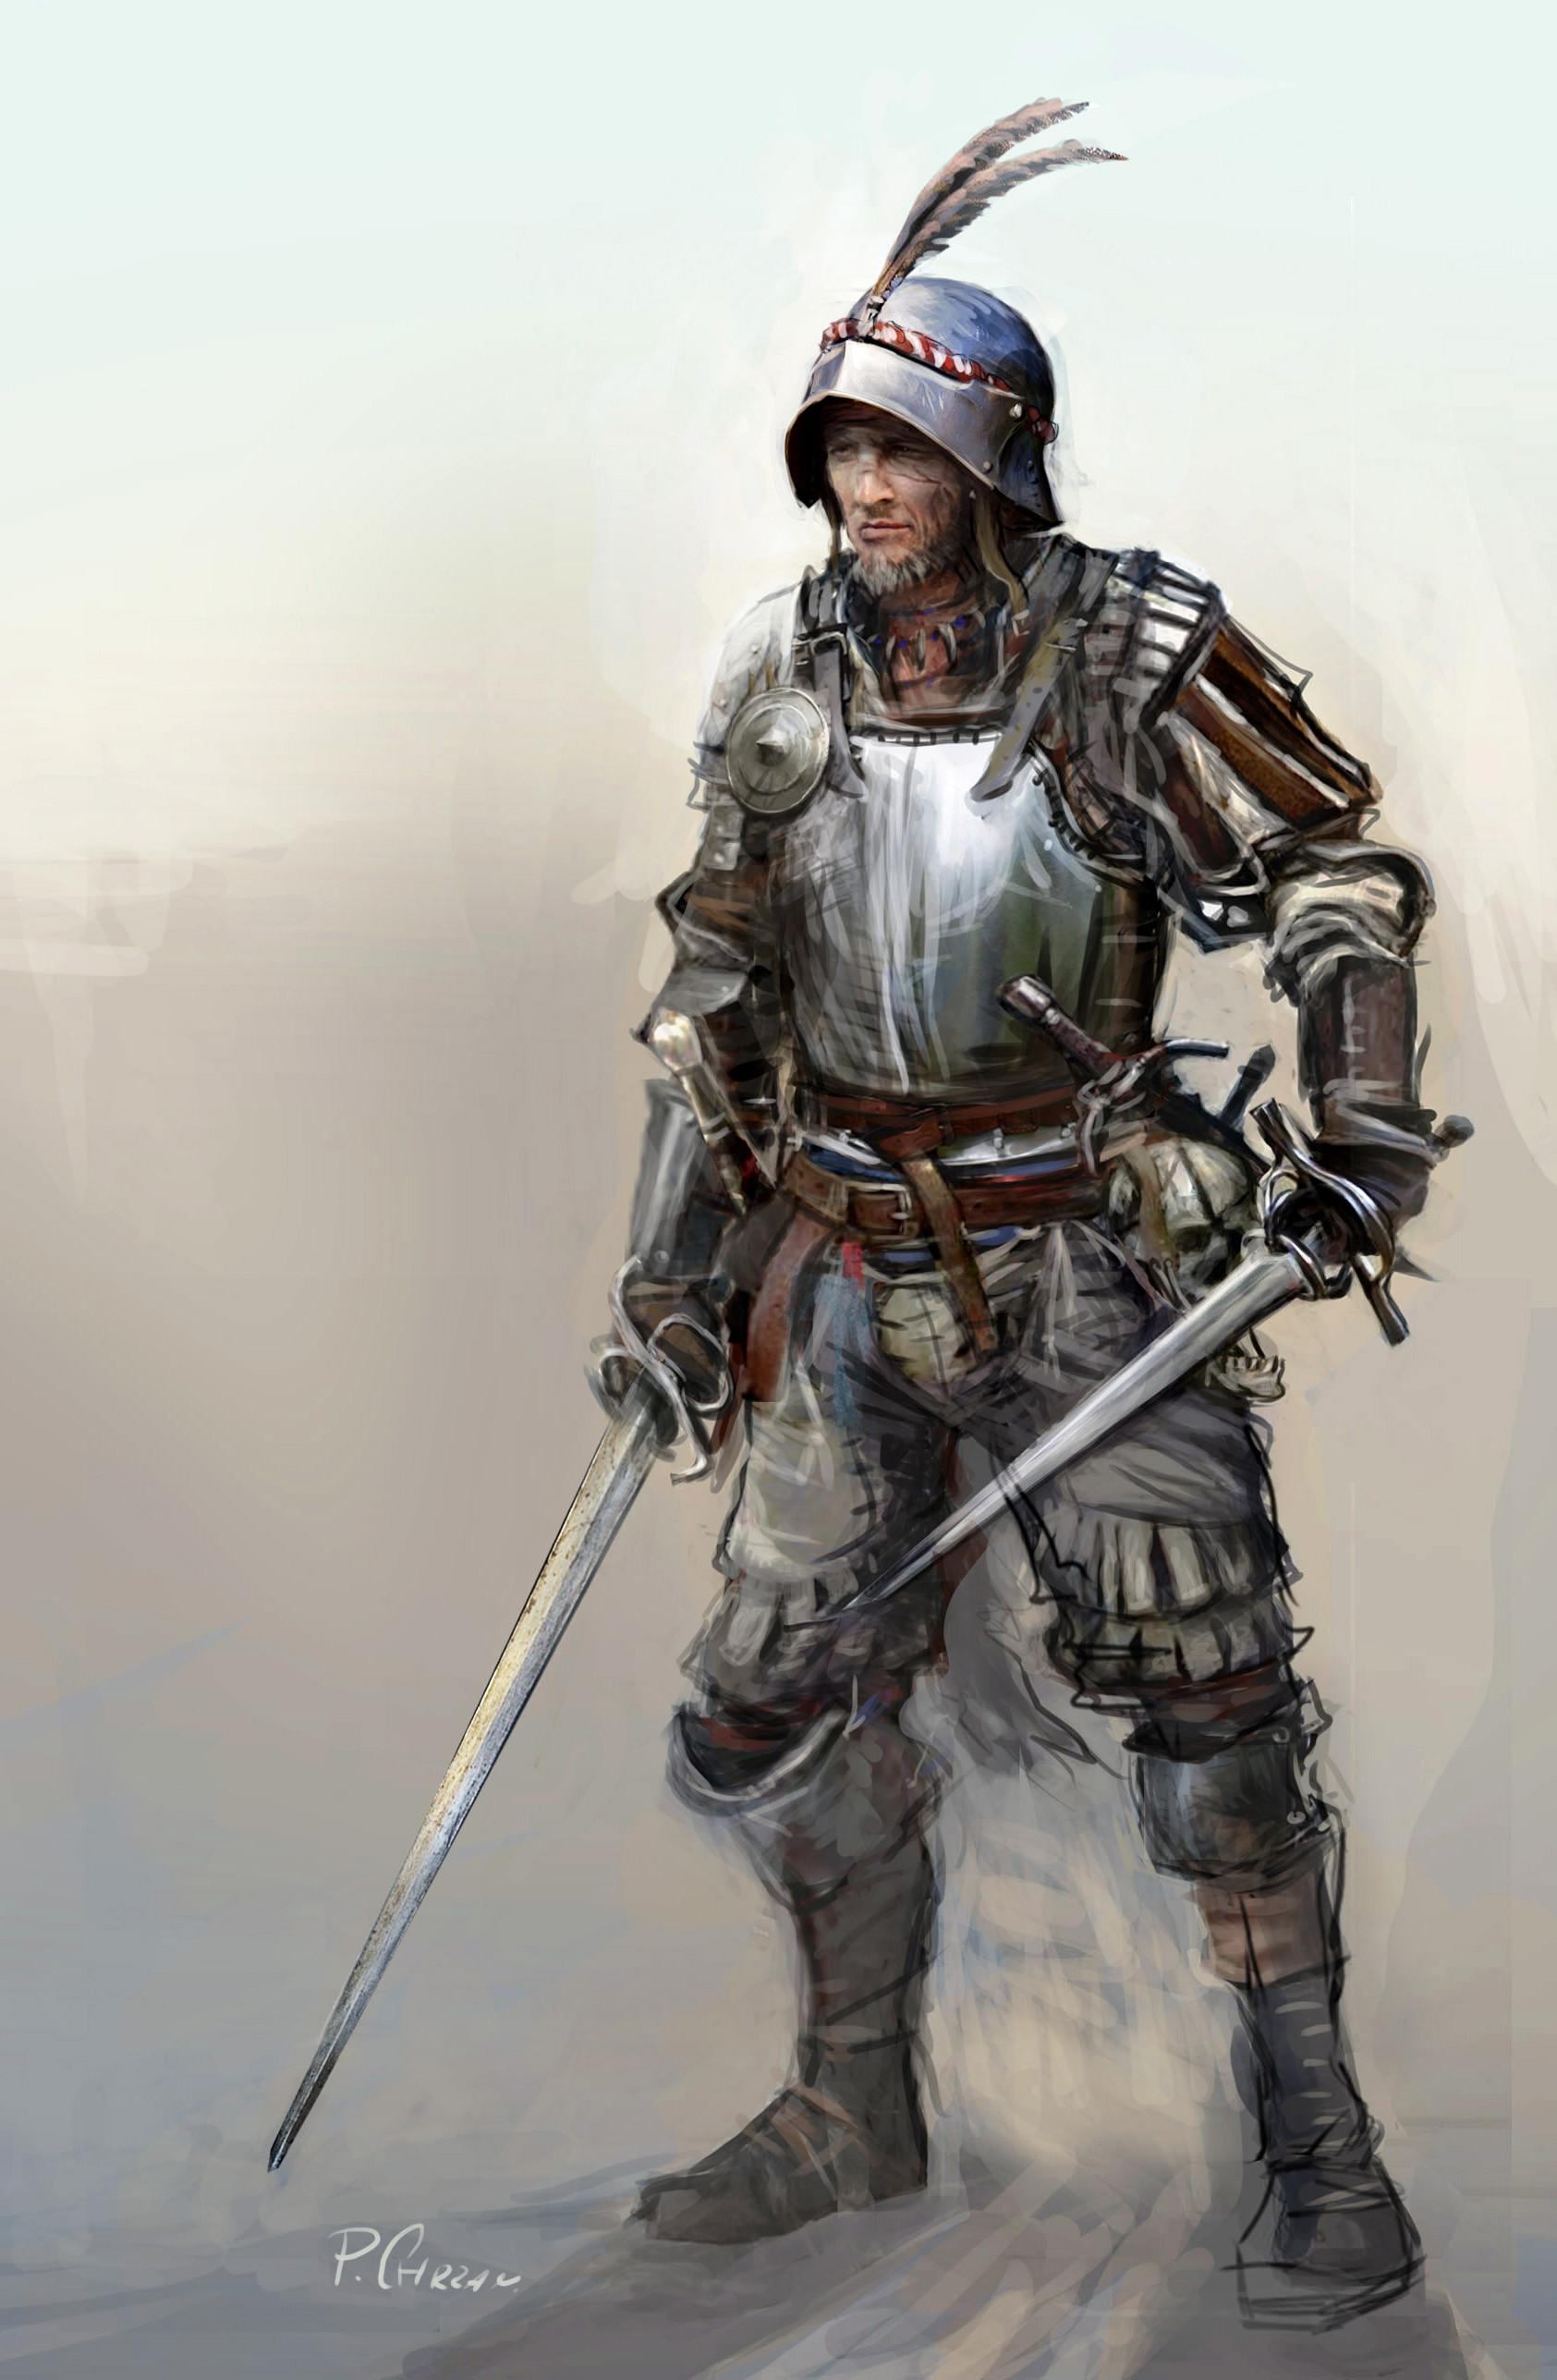 https://cdna.artstation.com/p/assets/images/images/005/676/786/large/piotr-chrzanowski-renaissance-character-111.jpg?1492949489